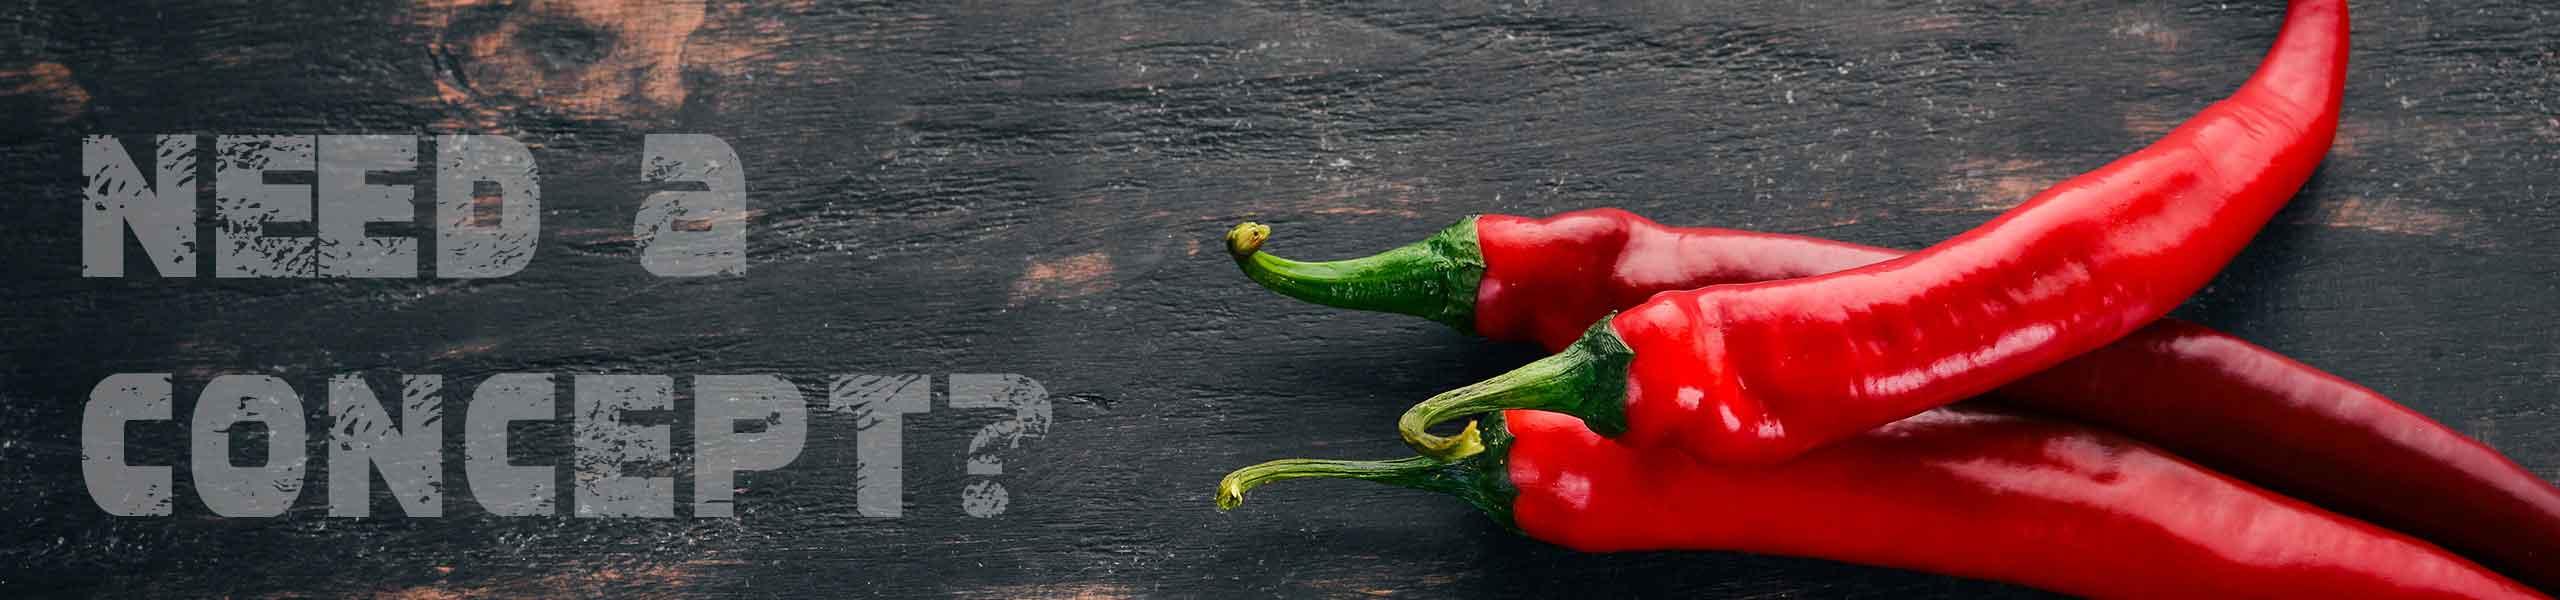 spicy concepts | Full Service Agentur